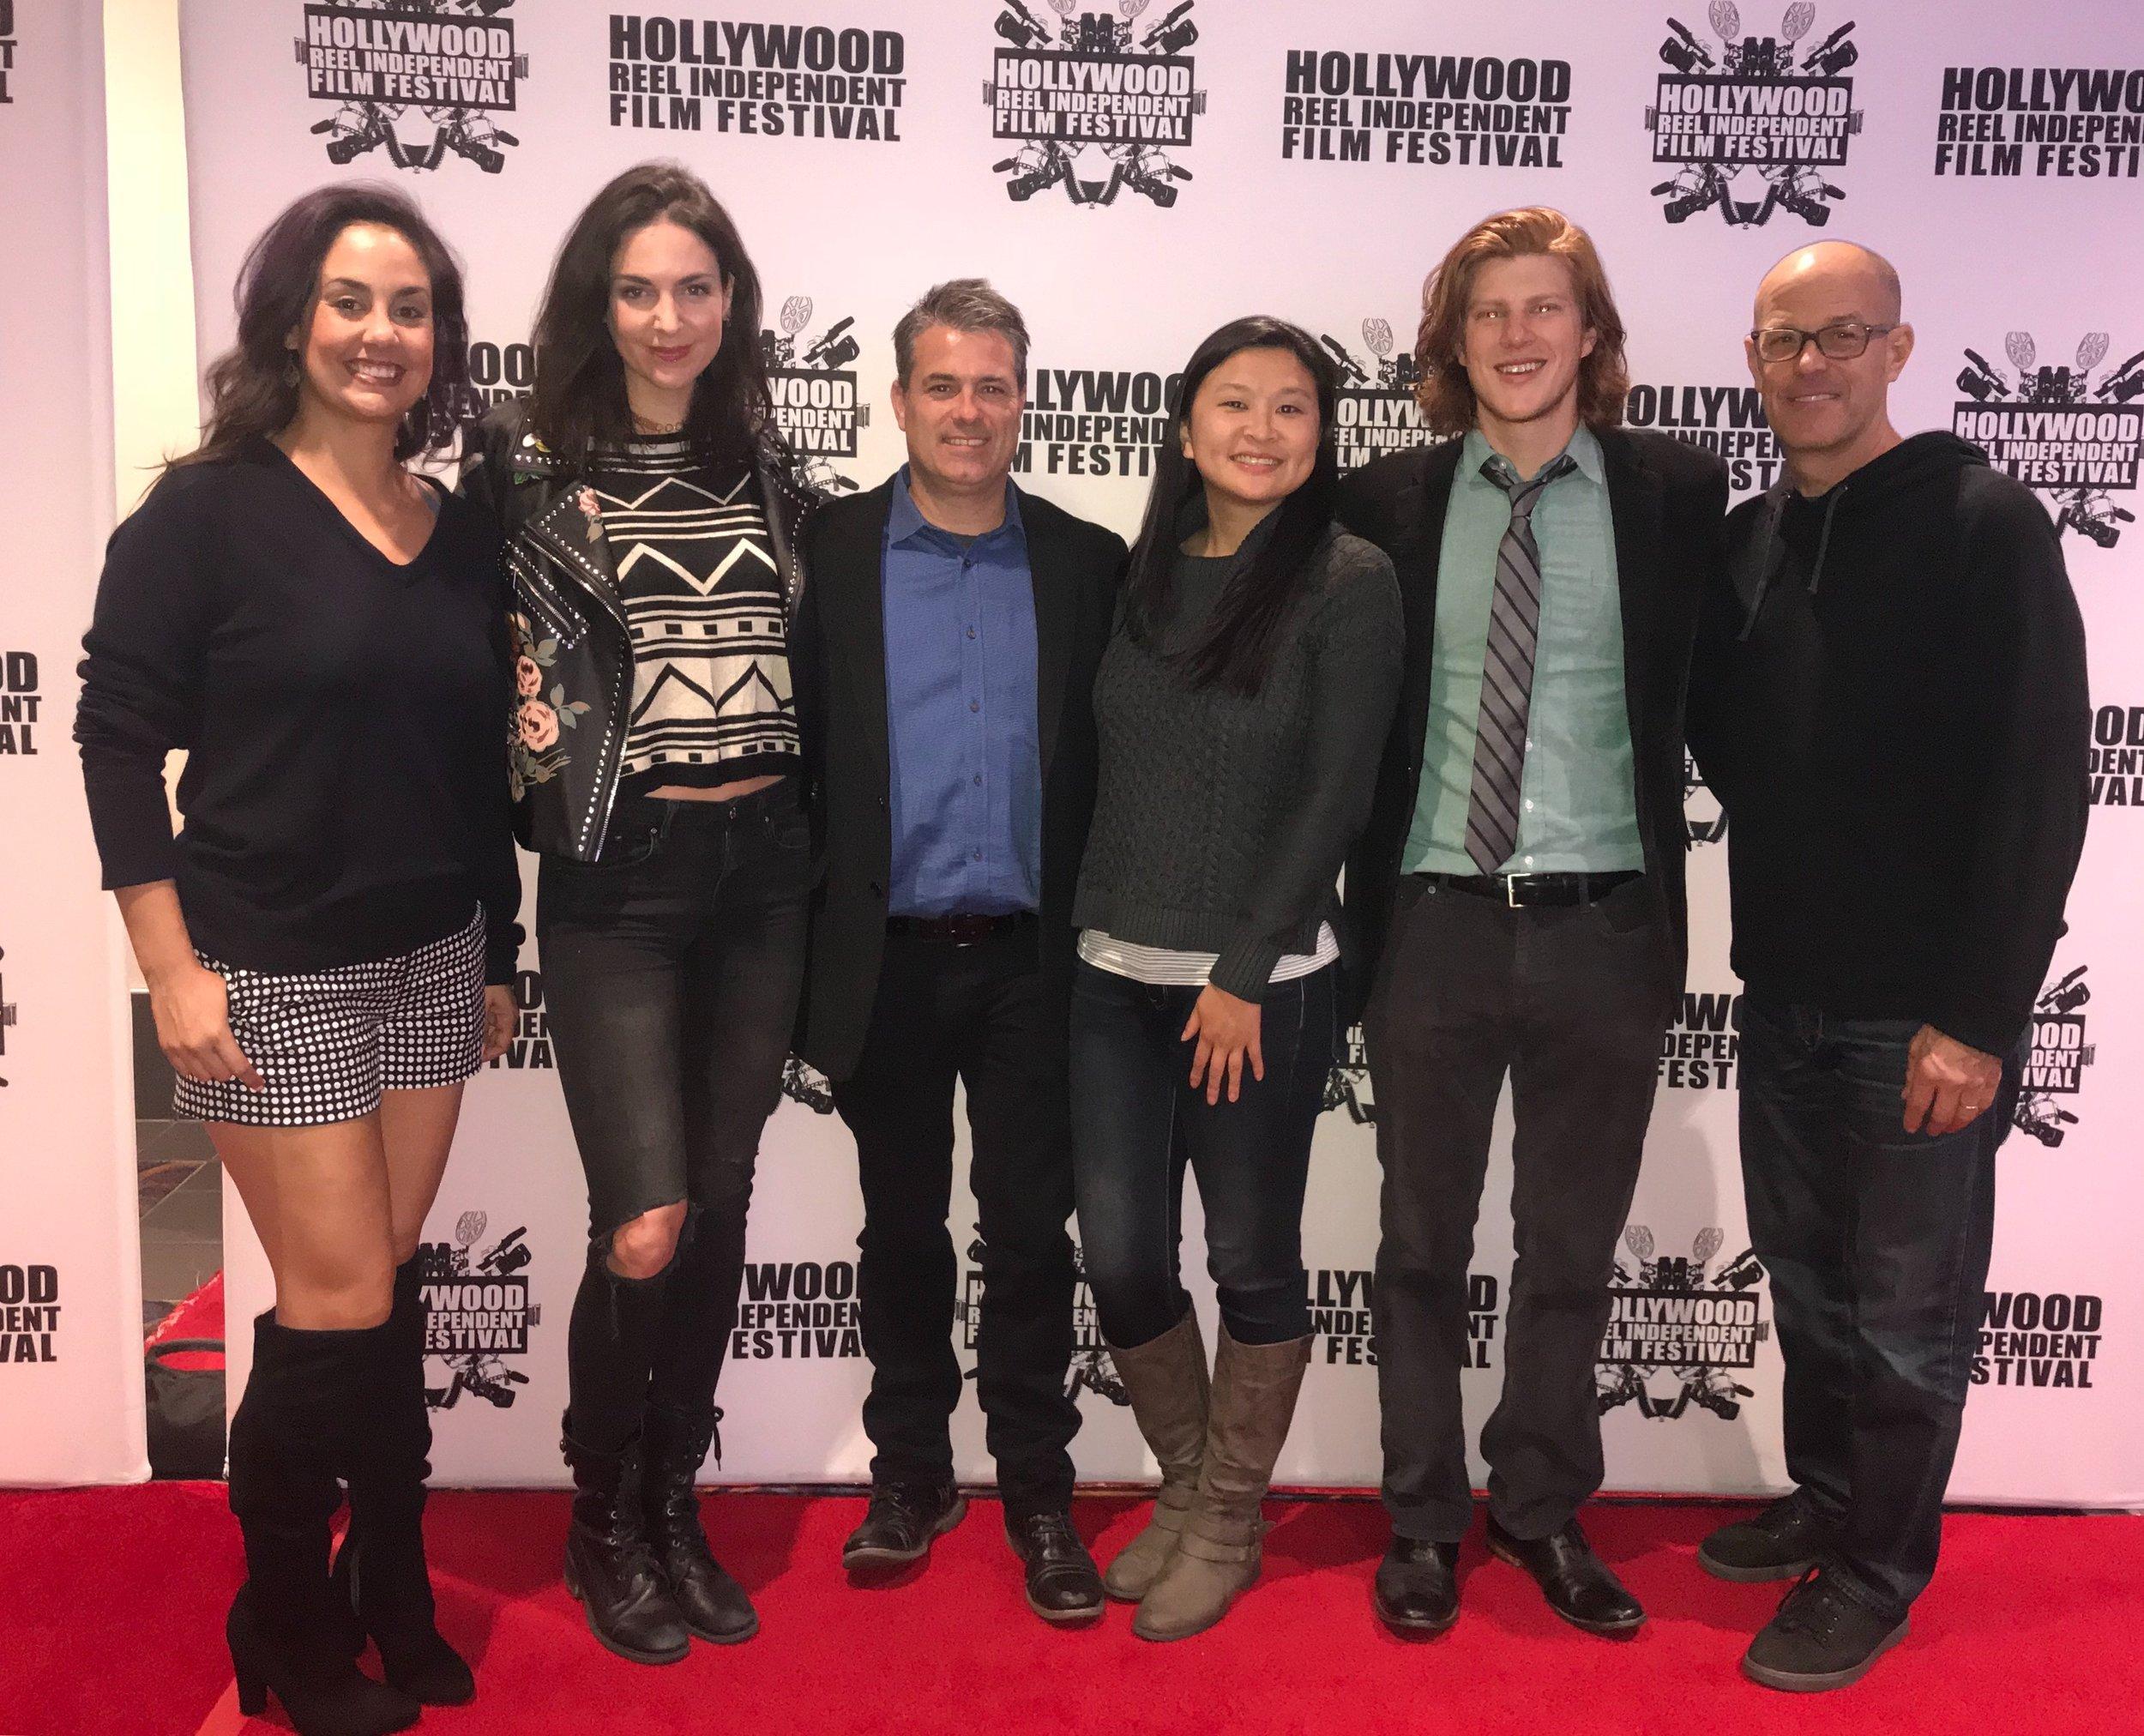 2018 HRIFF Crew